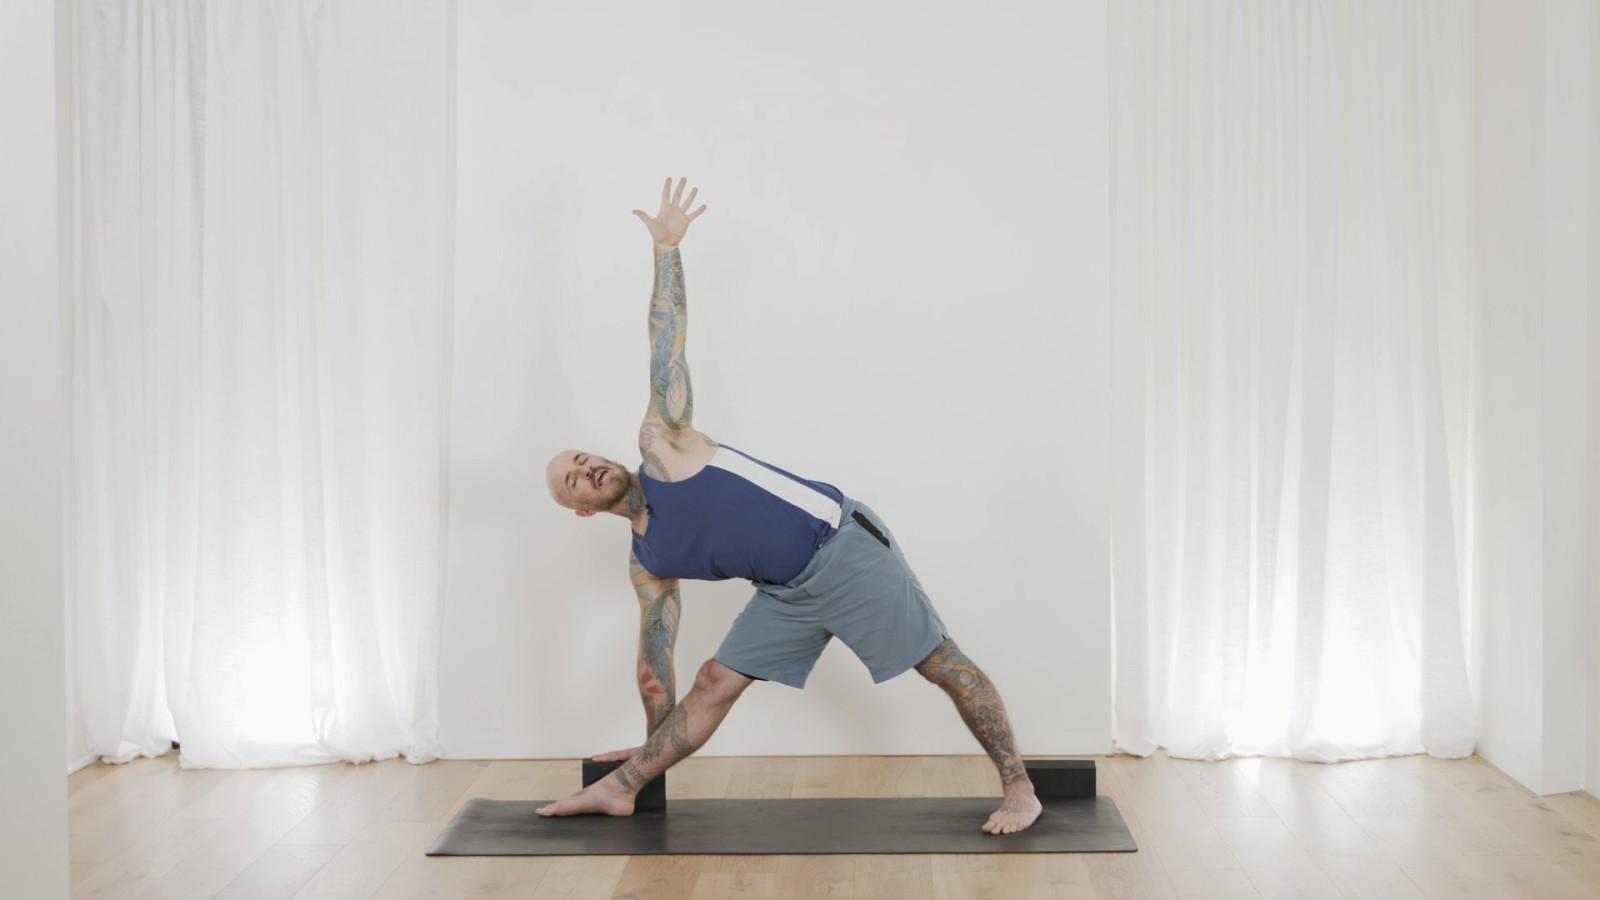 Yoga Foundations - Understanding Triangle Pose with Ari Levanael